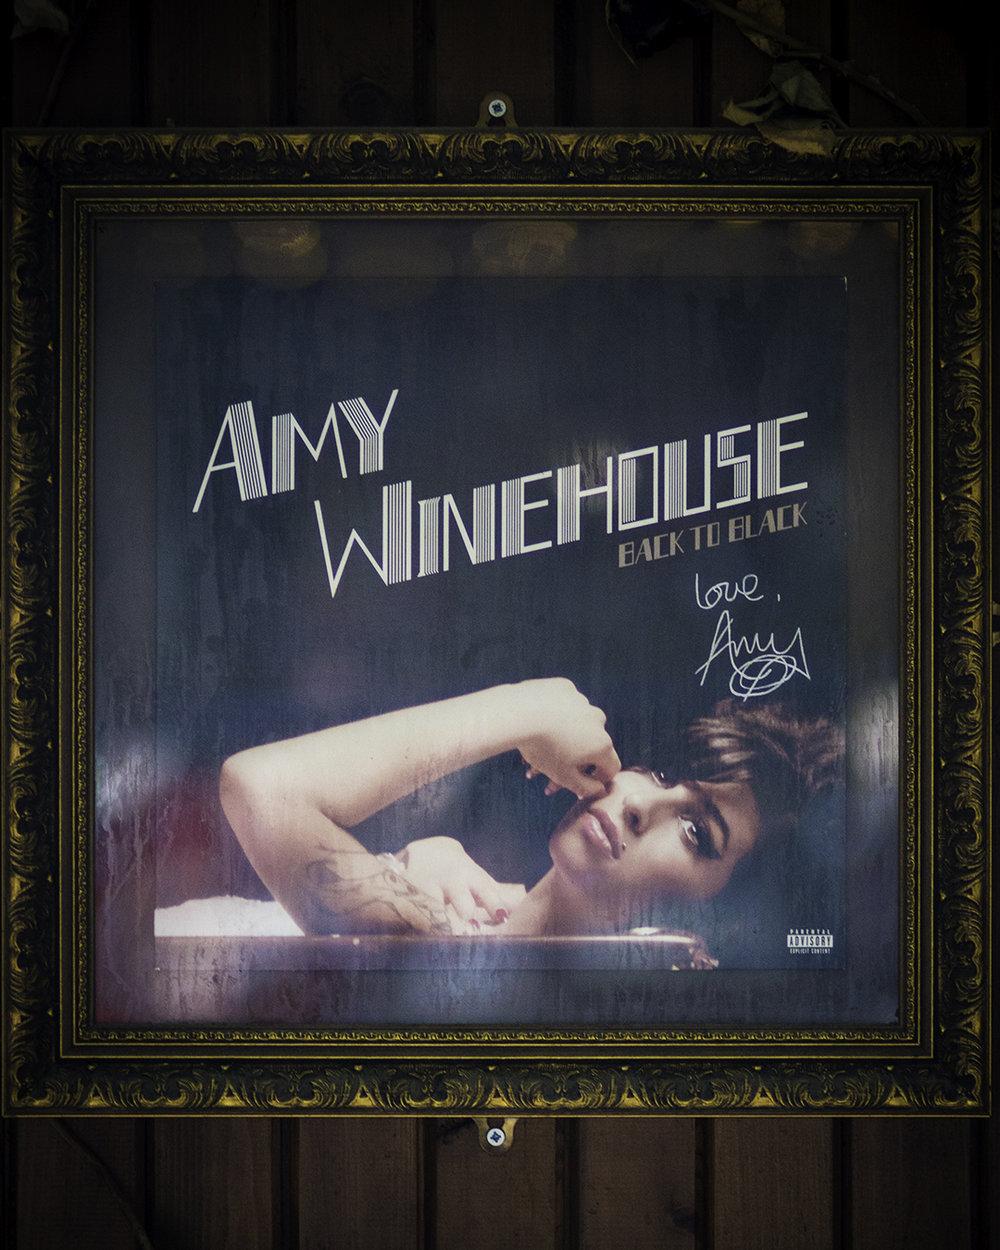 AMY Record.jpg